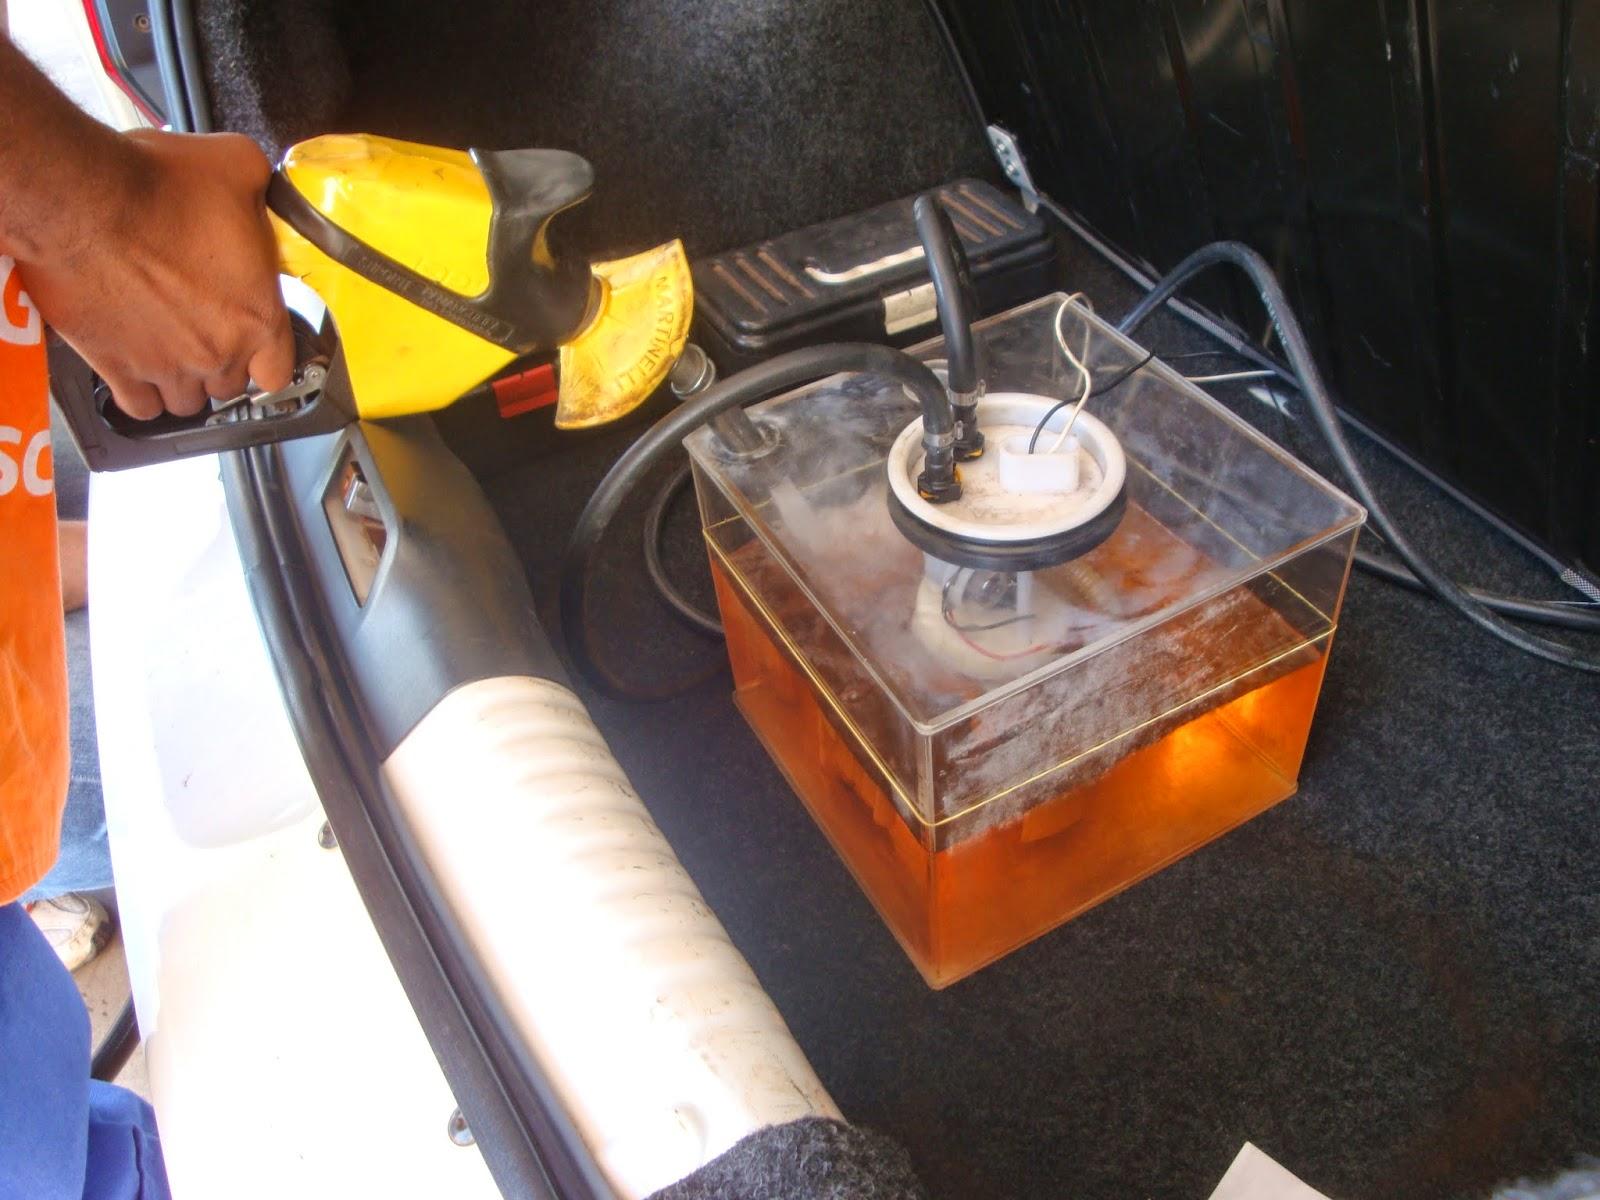 265b875cc9b Max EPR  o economizador de combustível que funciona! ~ Garagem do Calfat